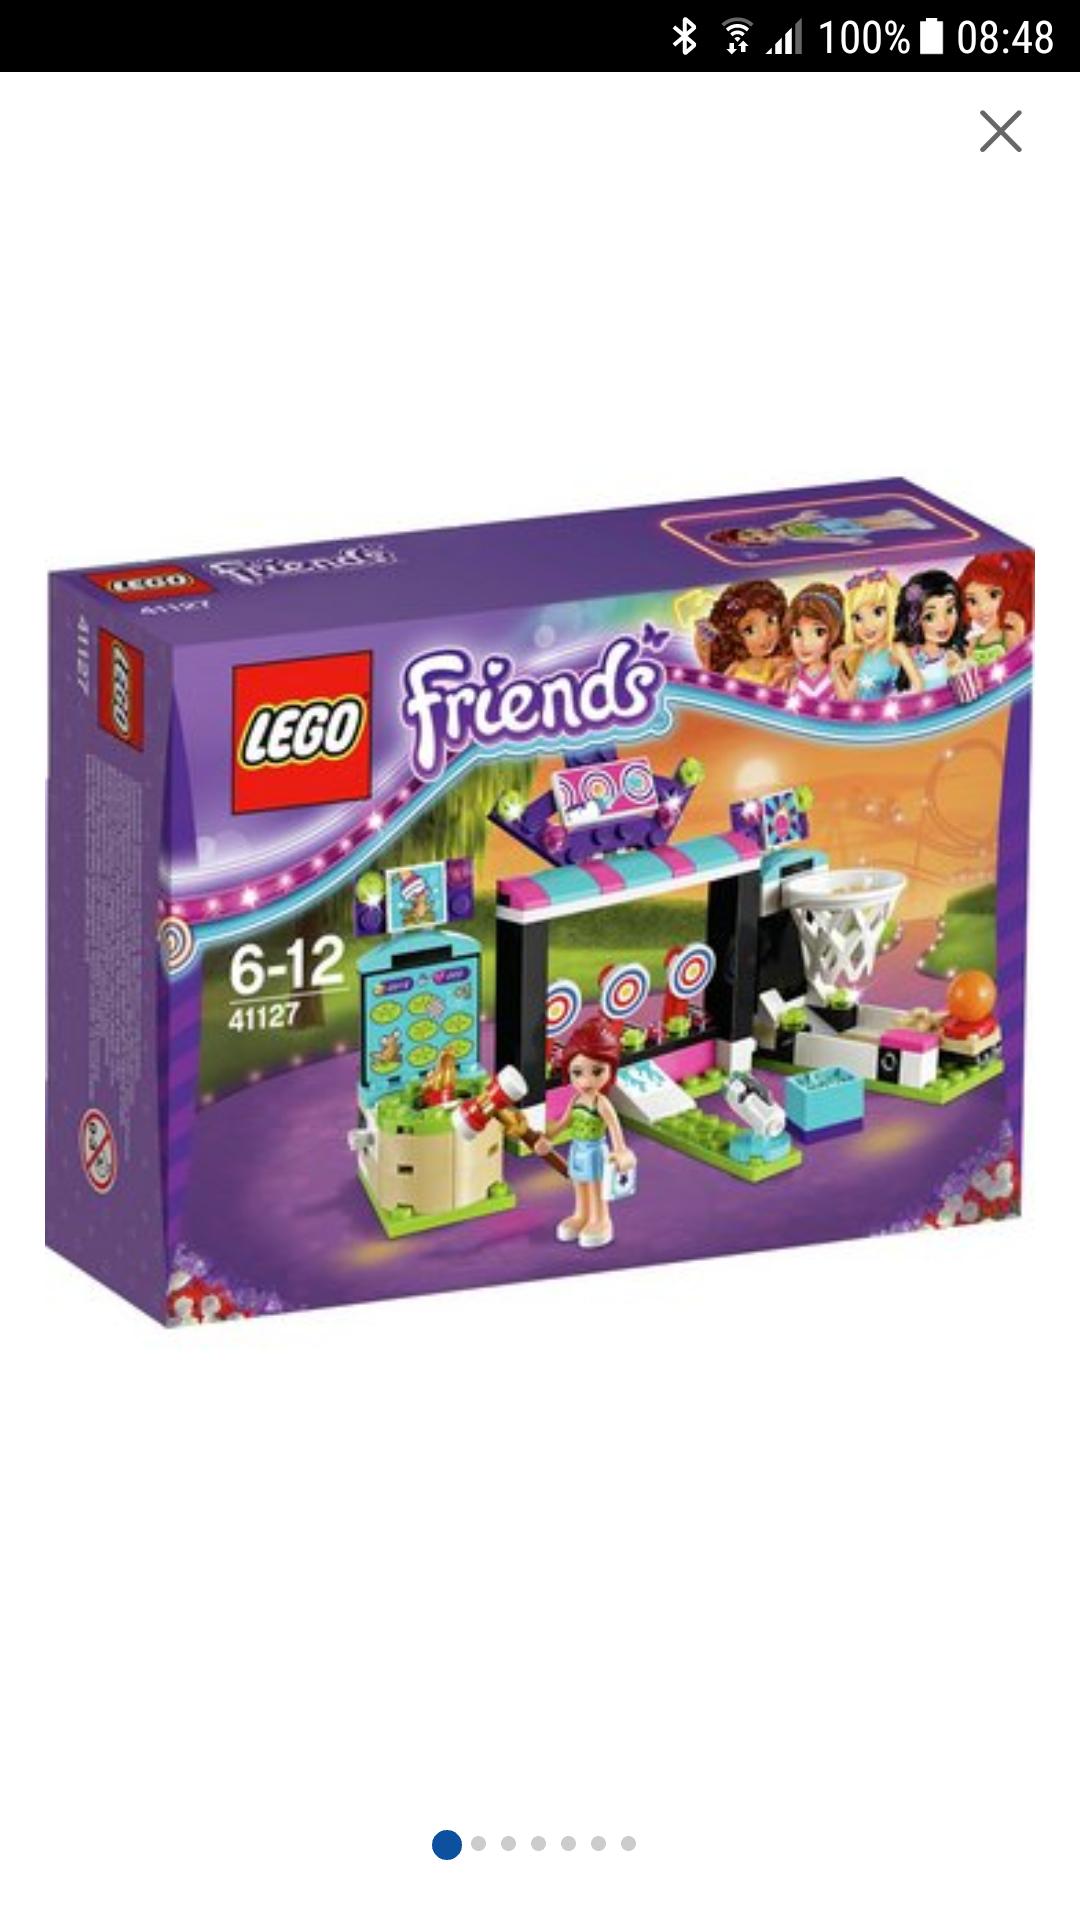 Lego friends amusement park arcade set 41127 £6.99 at argos